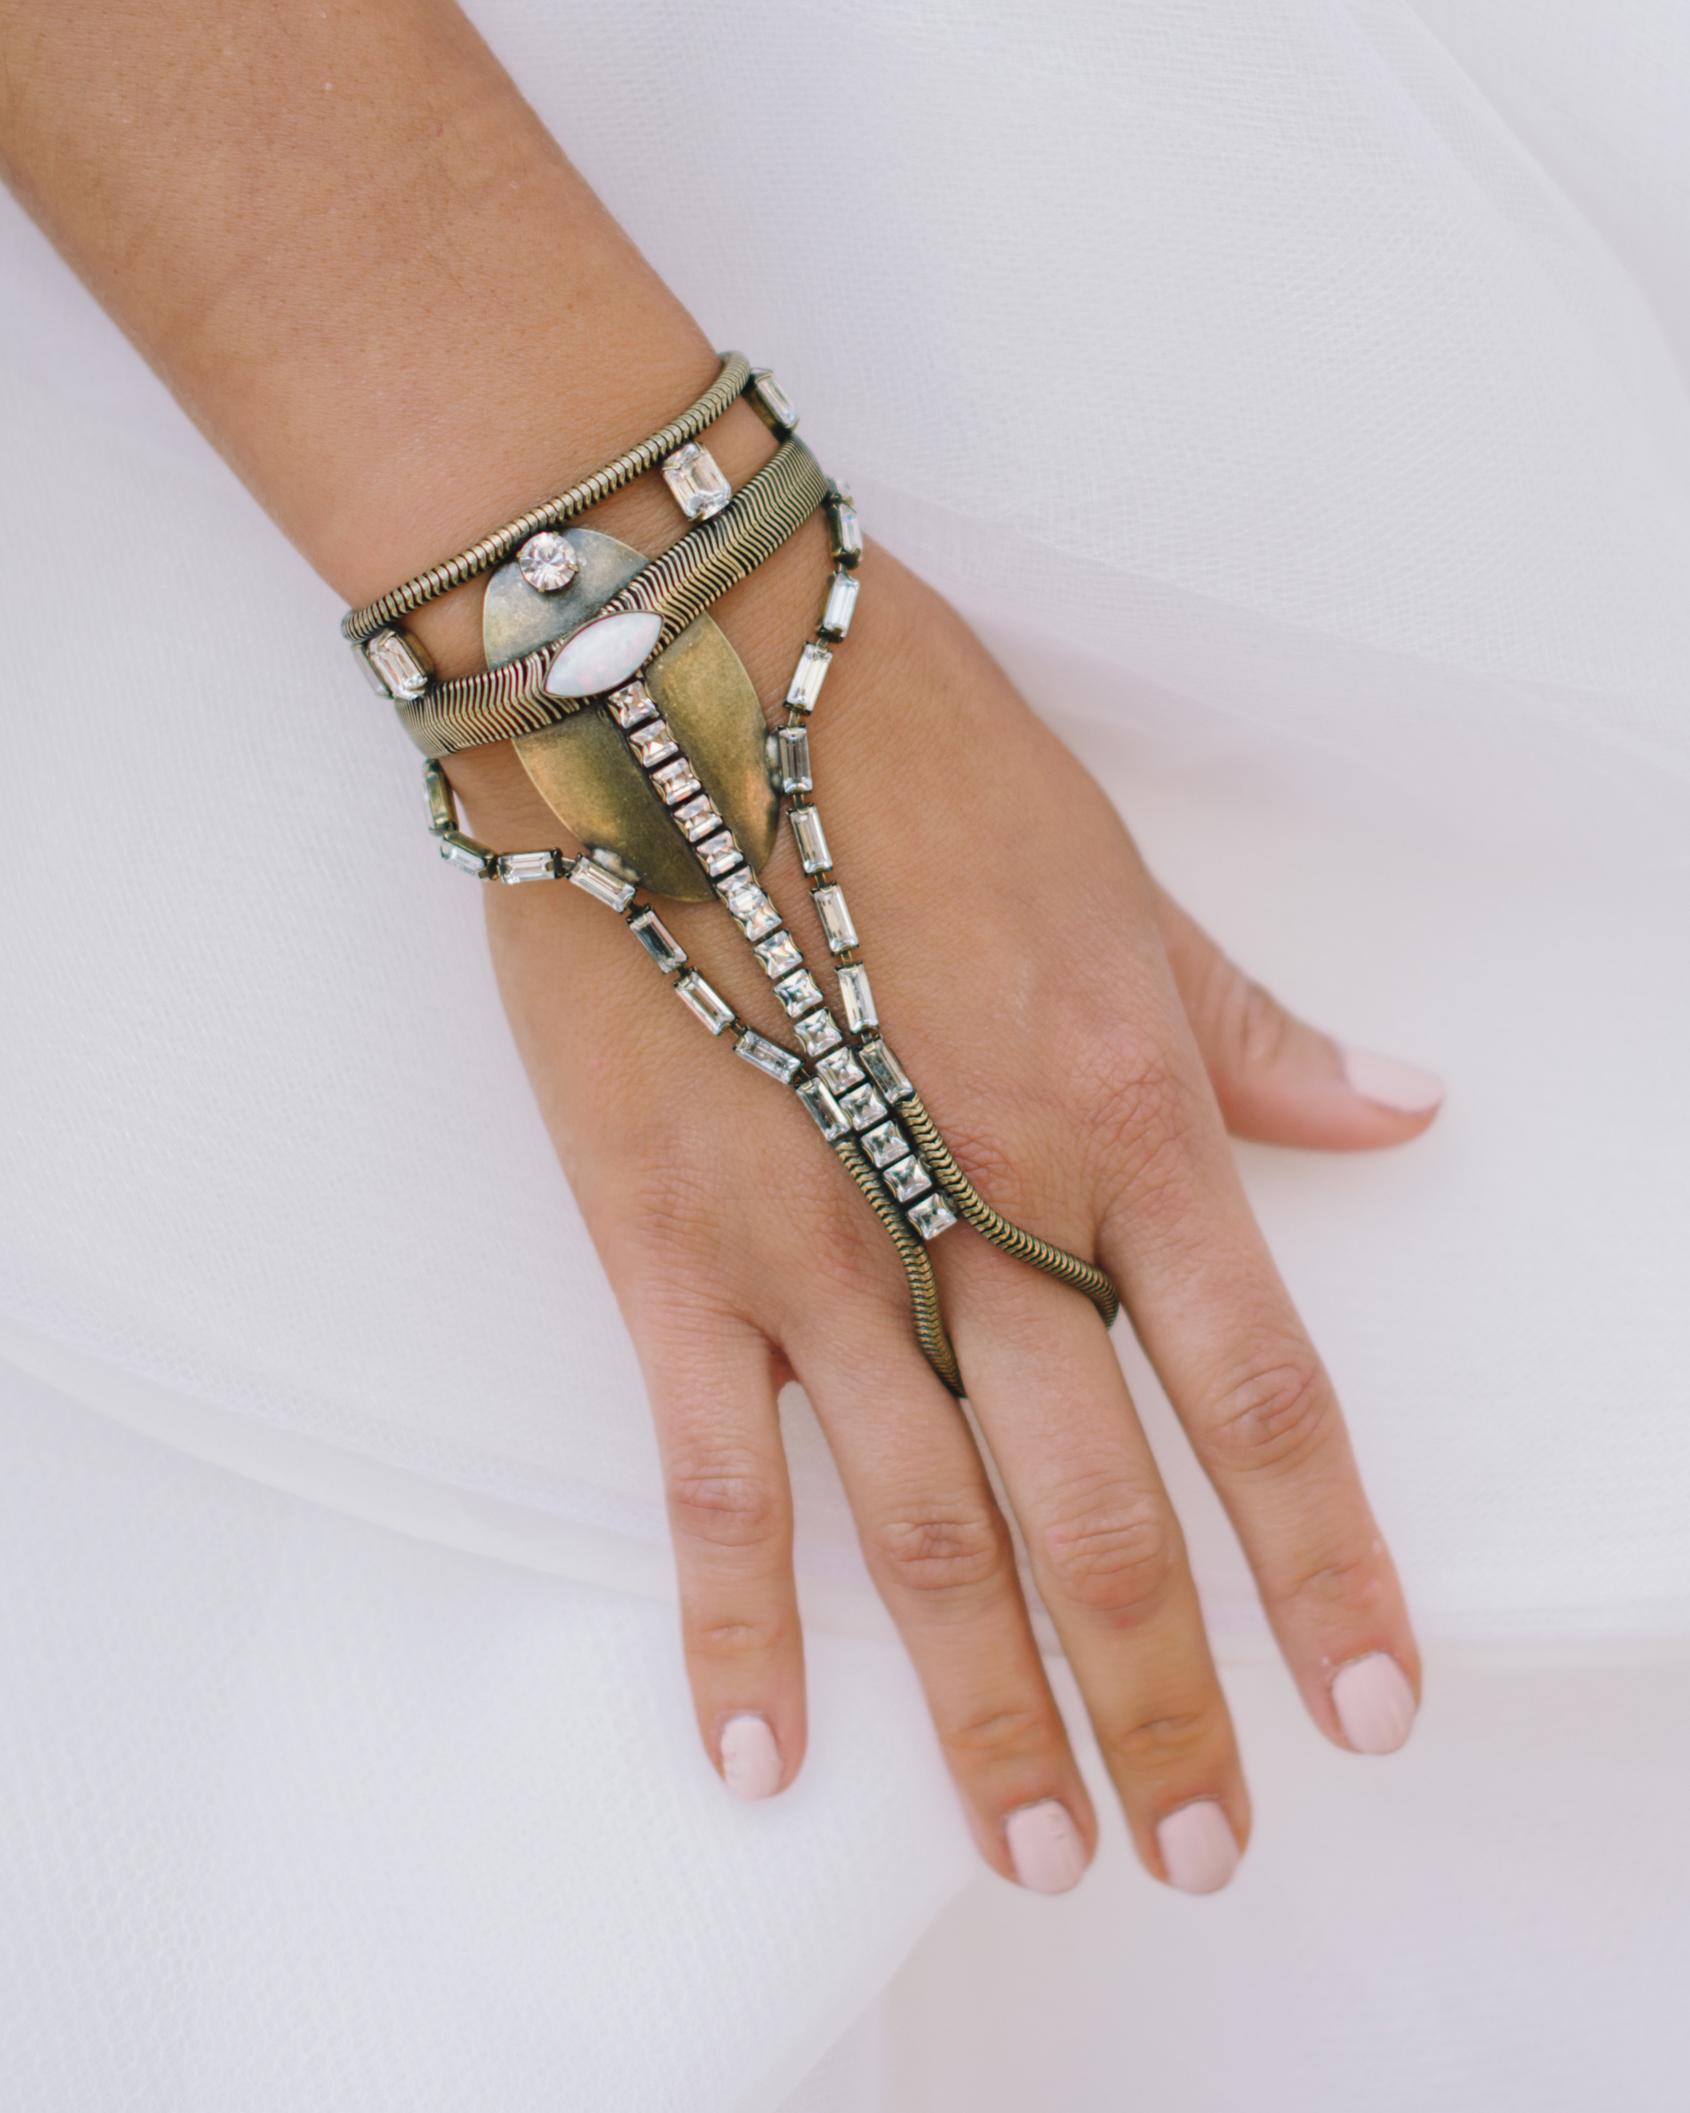 vanessa-joe-wedding-bracelet-7166-s111736-1214.jpg